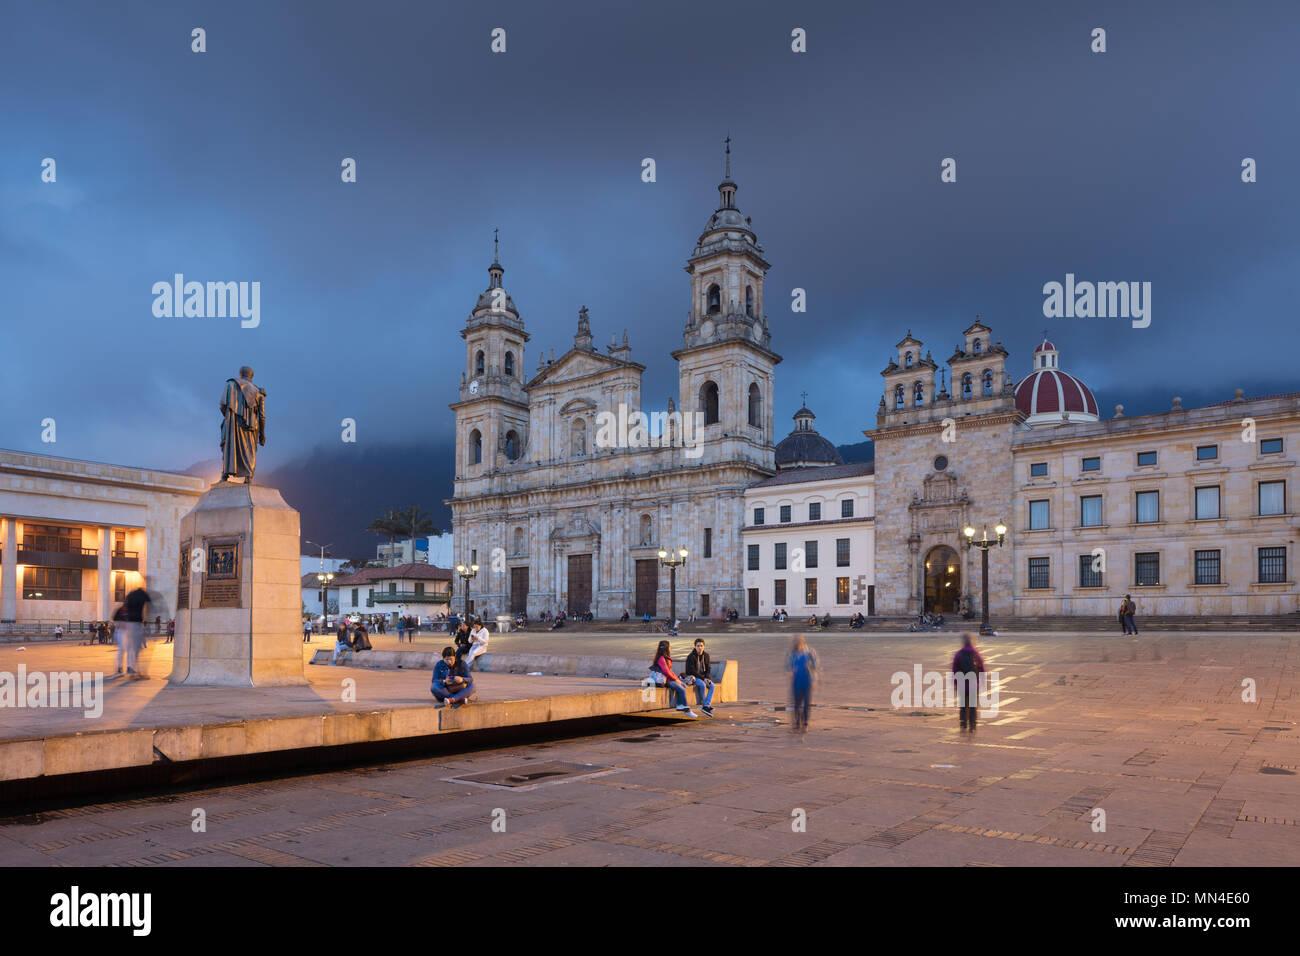 Plaza Bolívar al anochecer, Bogotá, Colombia Imagen De Stock